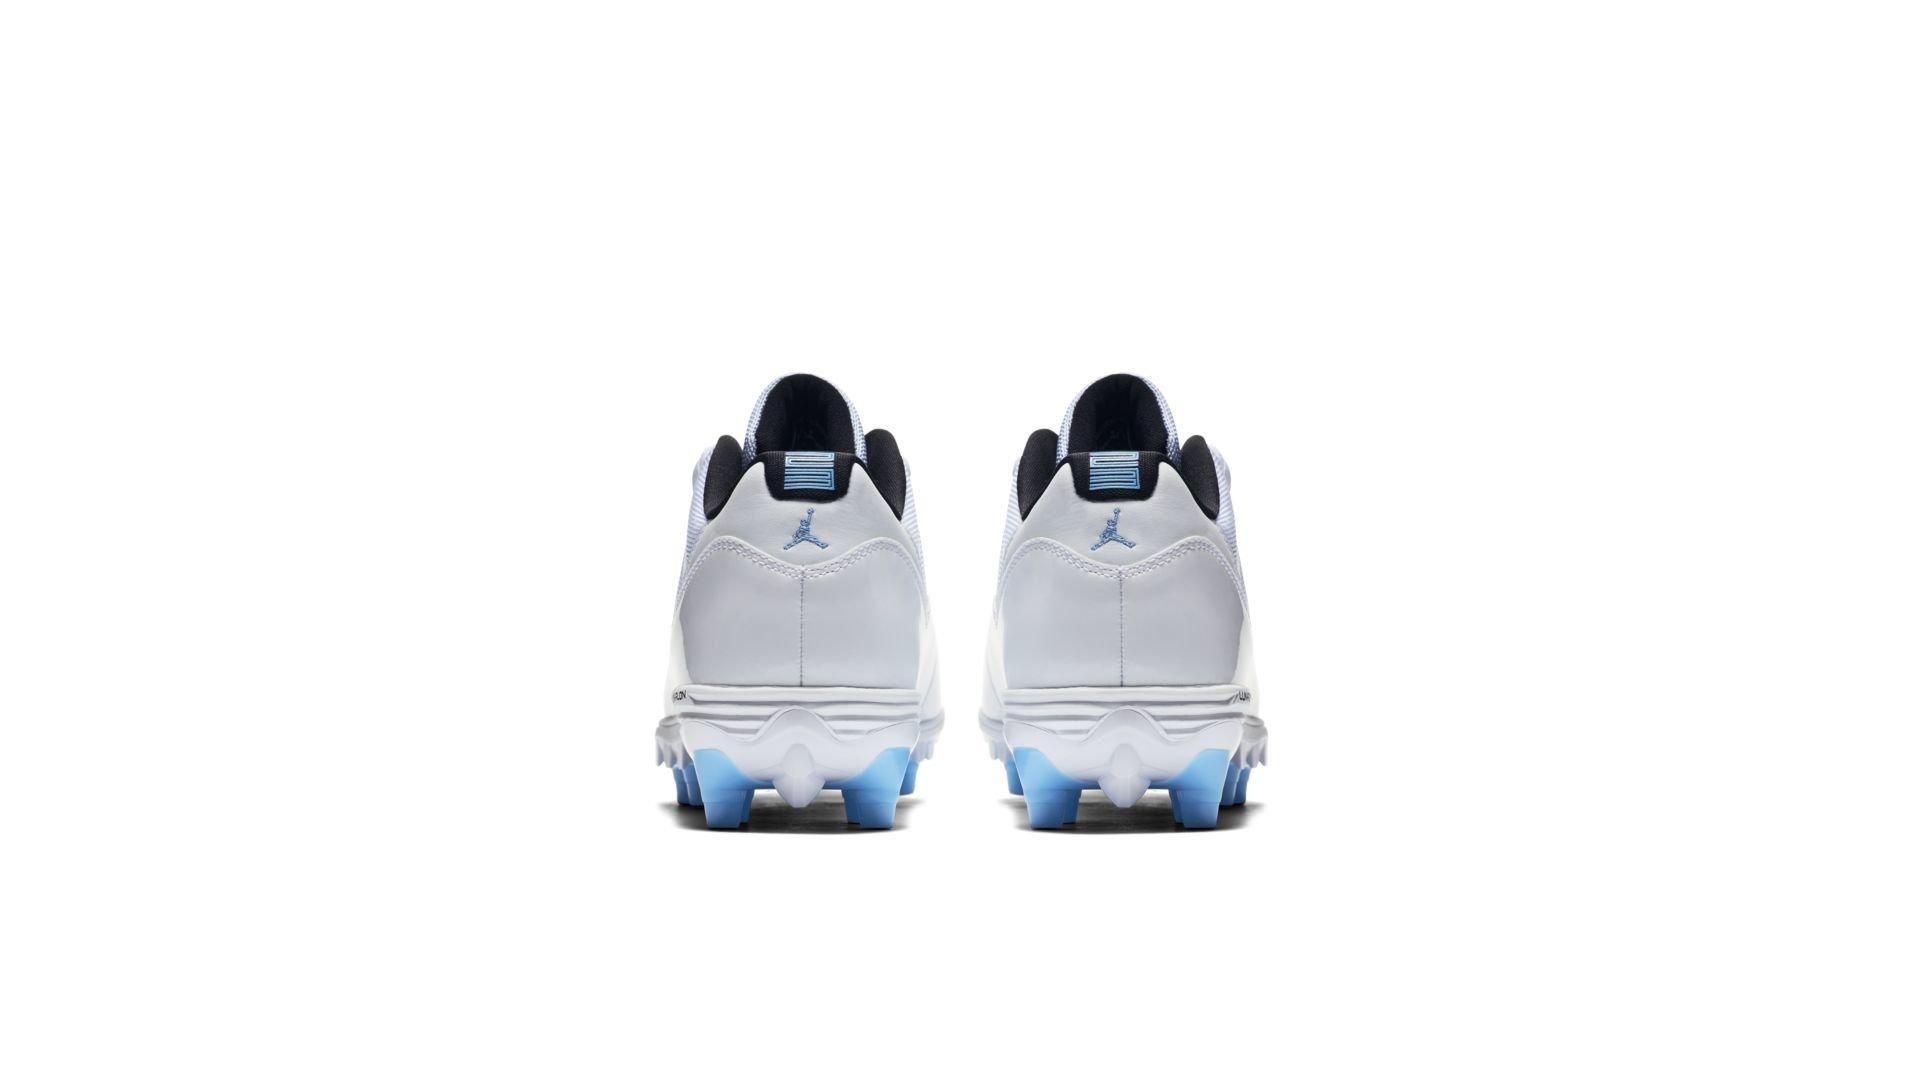 Jordan 11 Retro Low Cleat Columbia (AO1560-117)